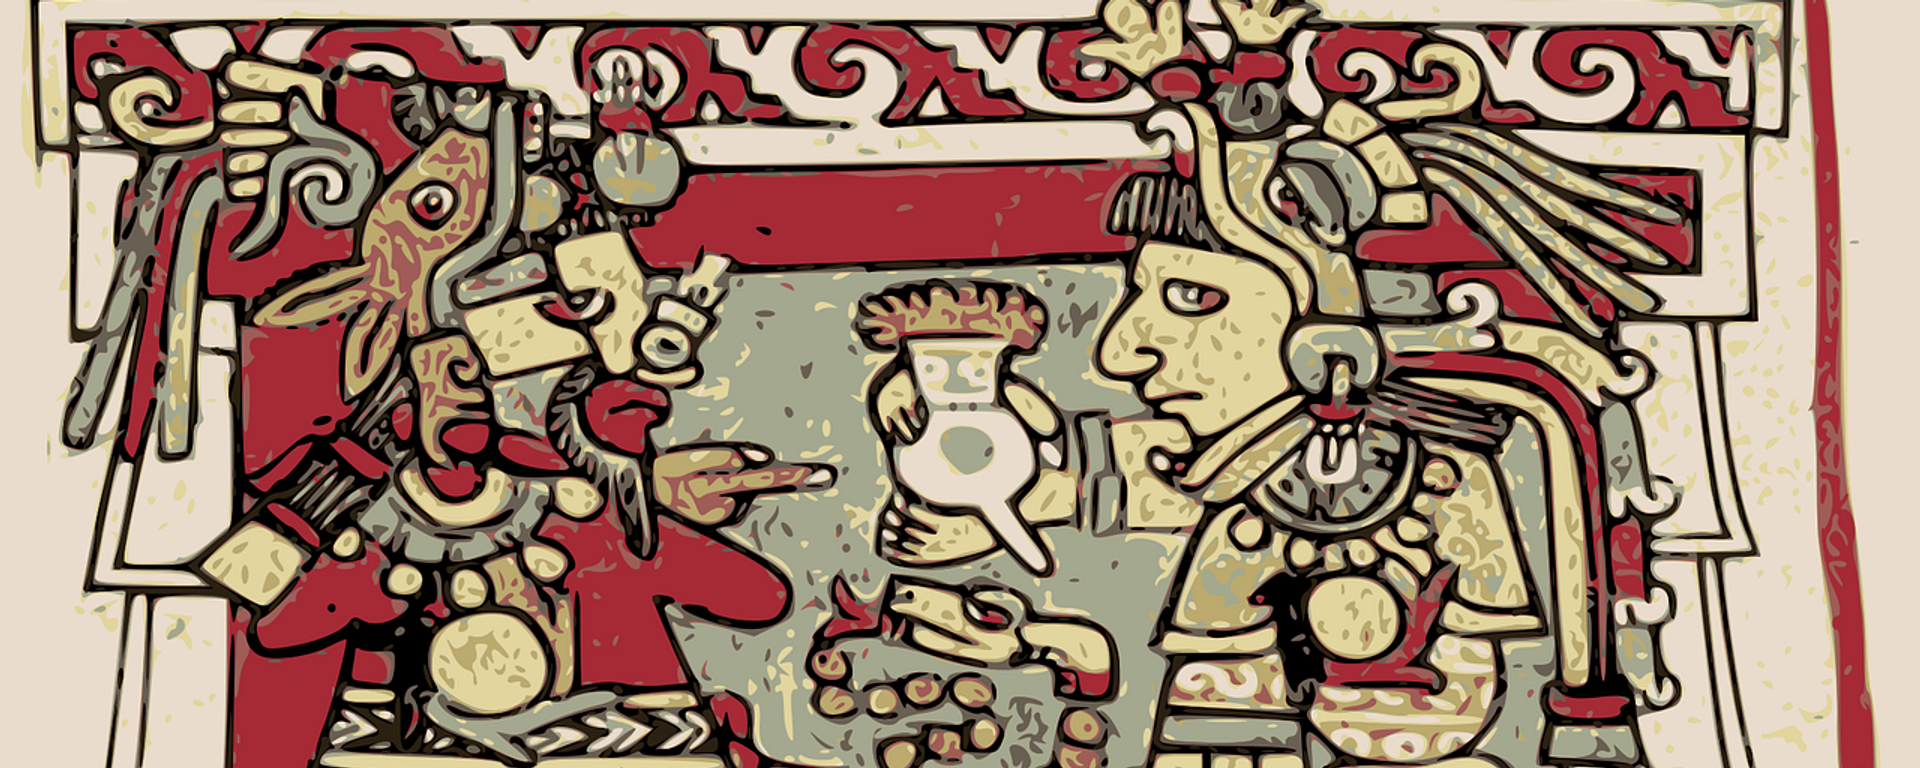 Un dibujo azteca - Sputnik Mundo, 1920, 12.08.2021